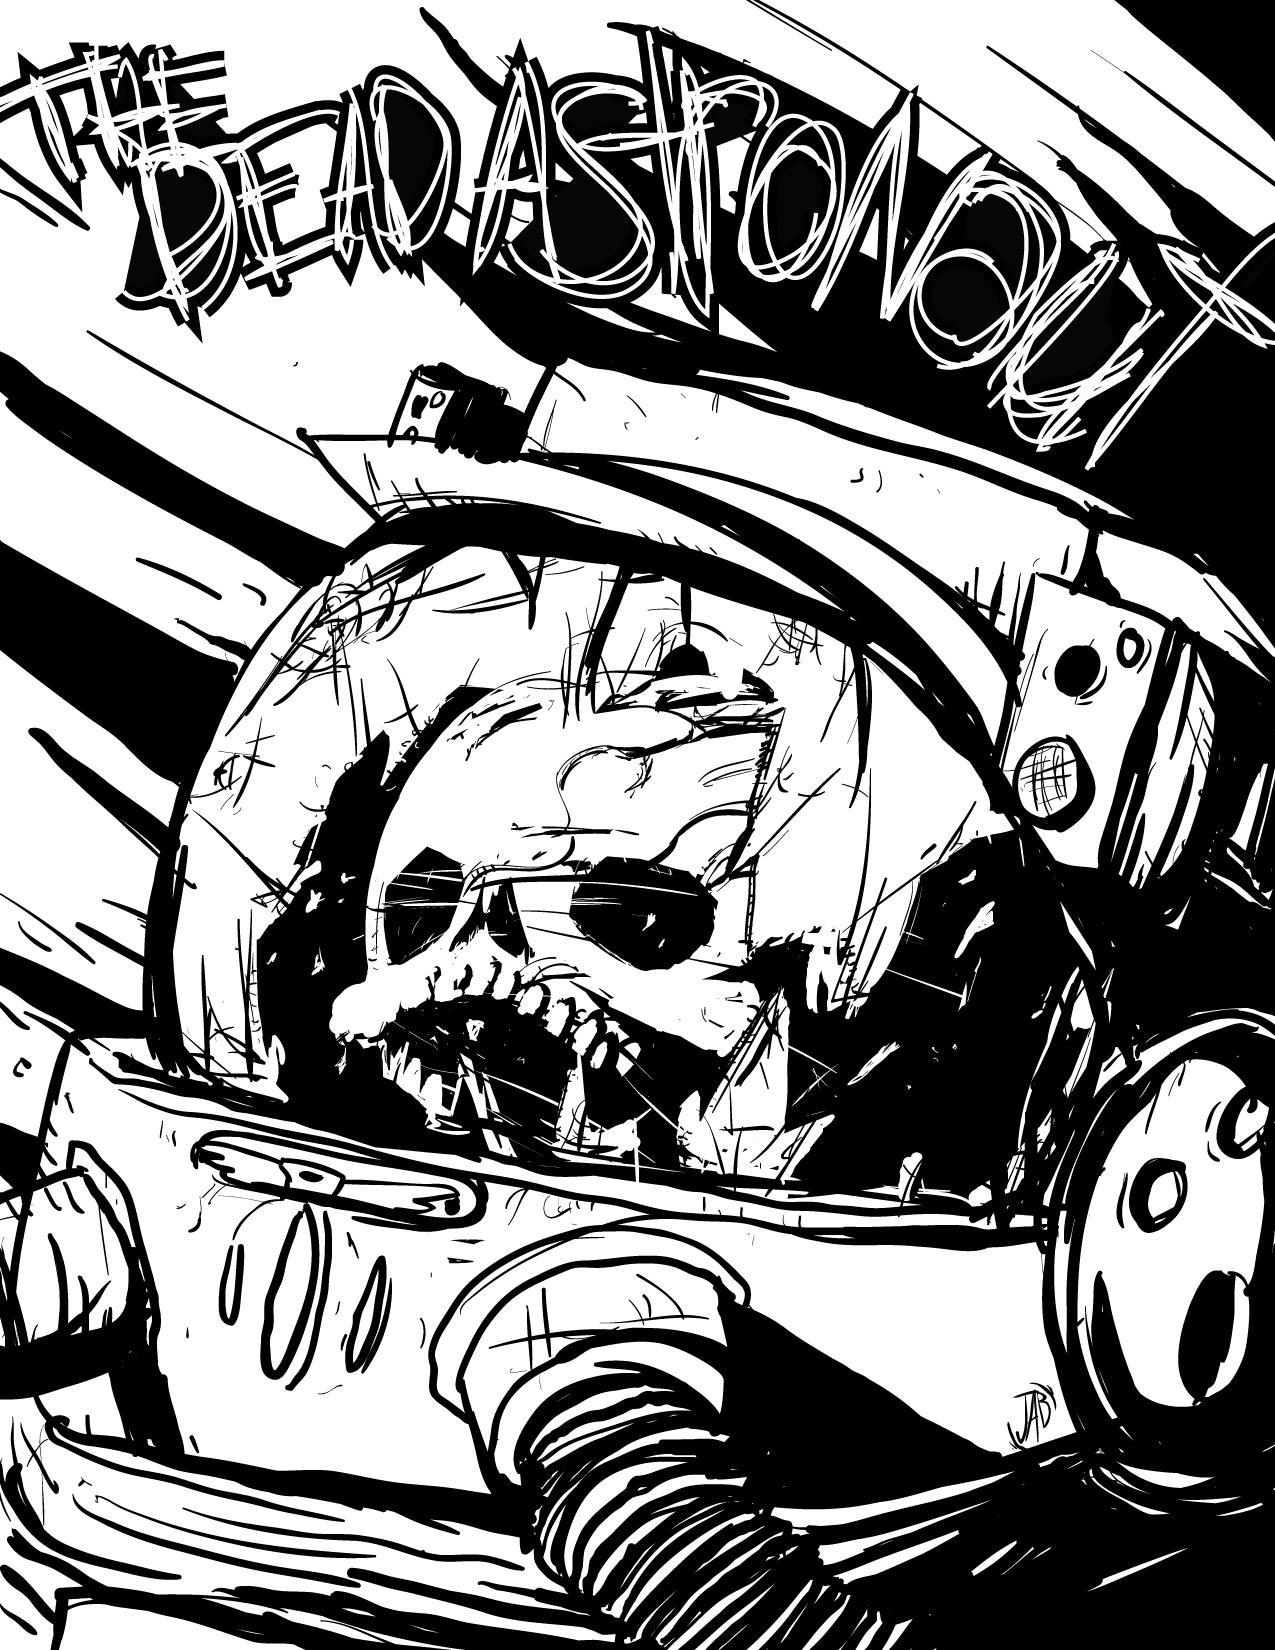 dead astronauts remains - 736×952